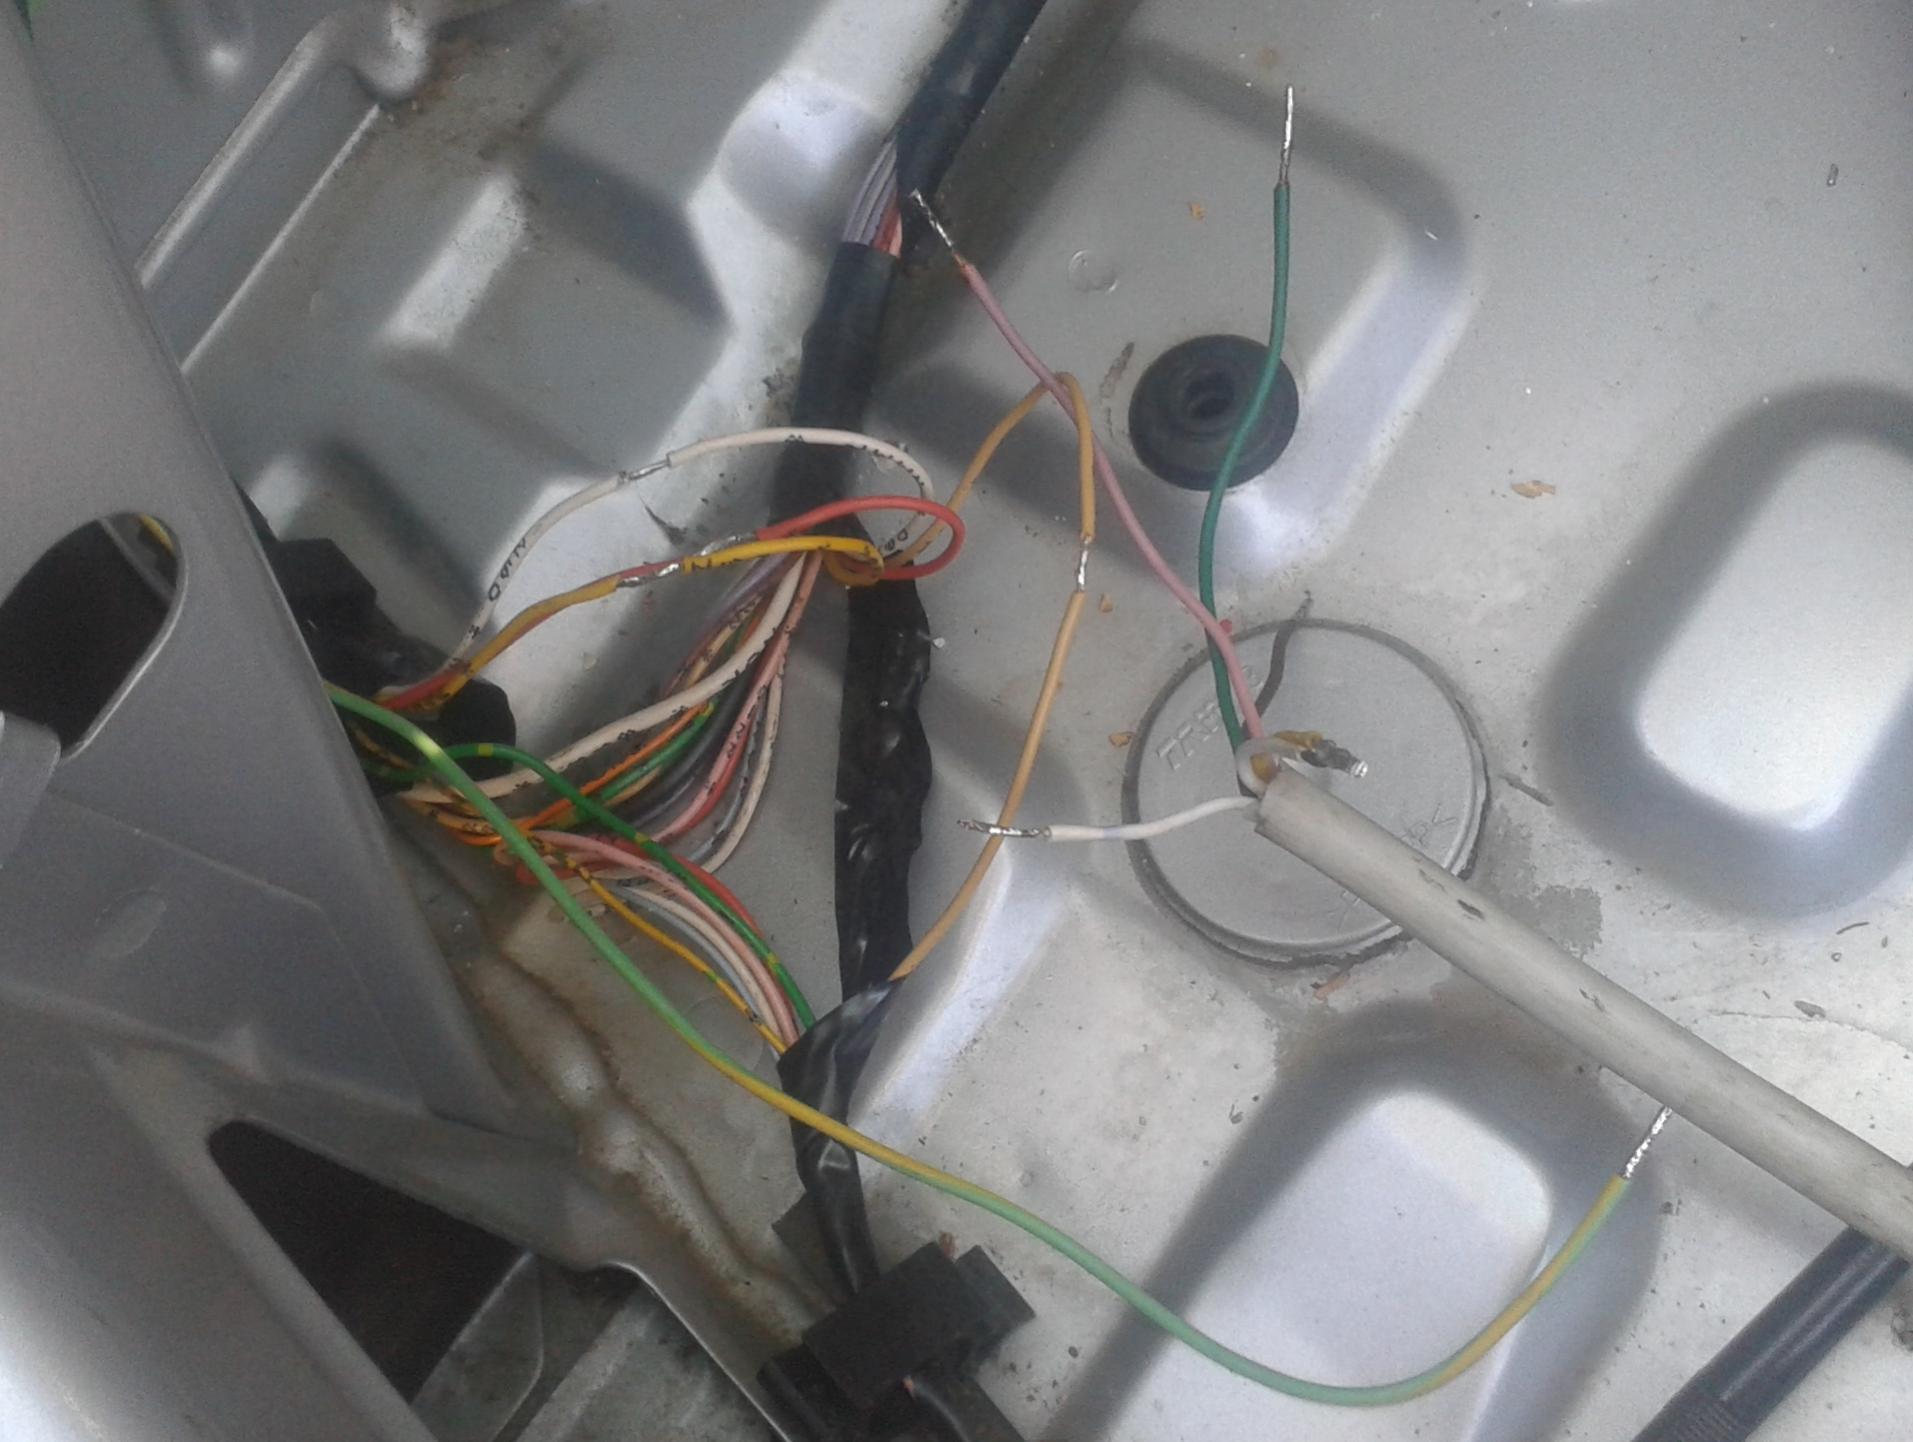 How to Tow Bar Electrics Peugeot 206 - HomemadeTools.net